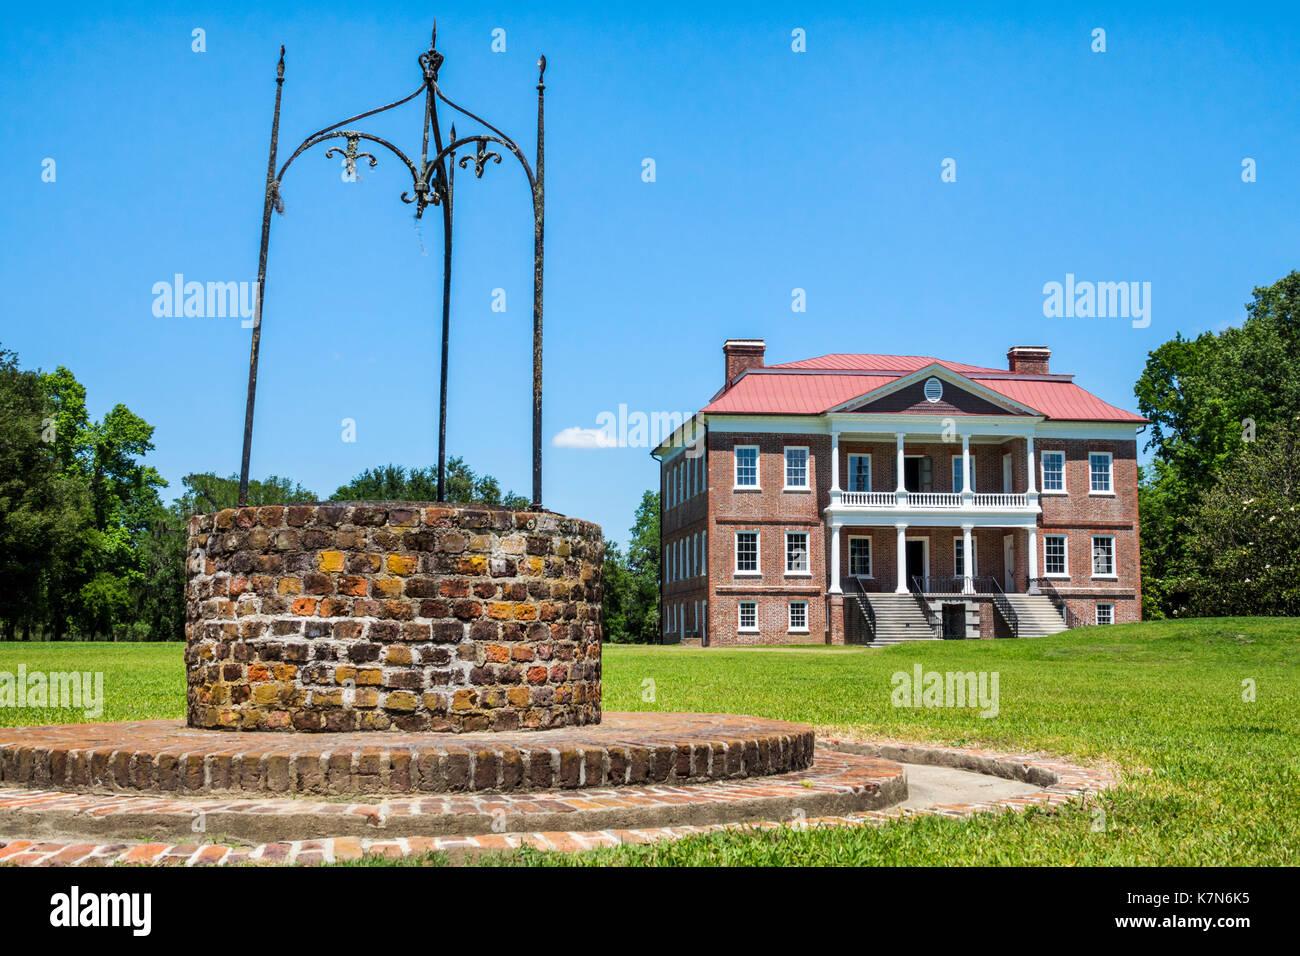 Charleston South Carolina SC Drayton Hall historic plantation preservation Palladian architecture brick water well - Stock Image